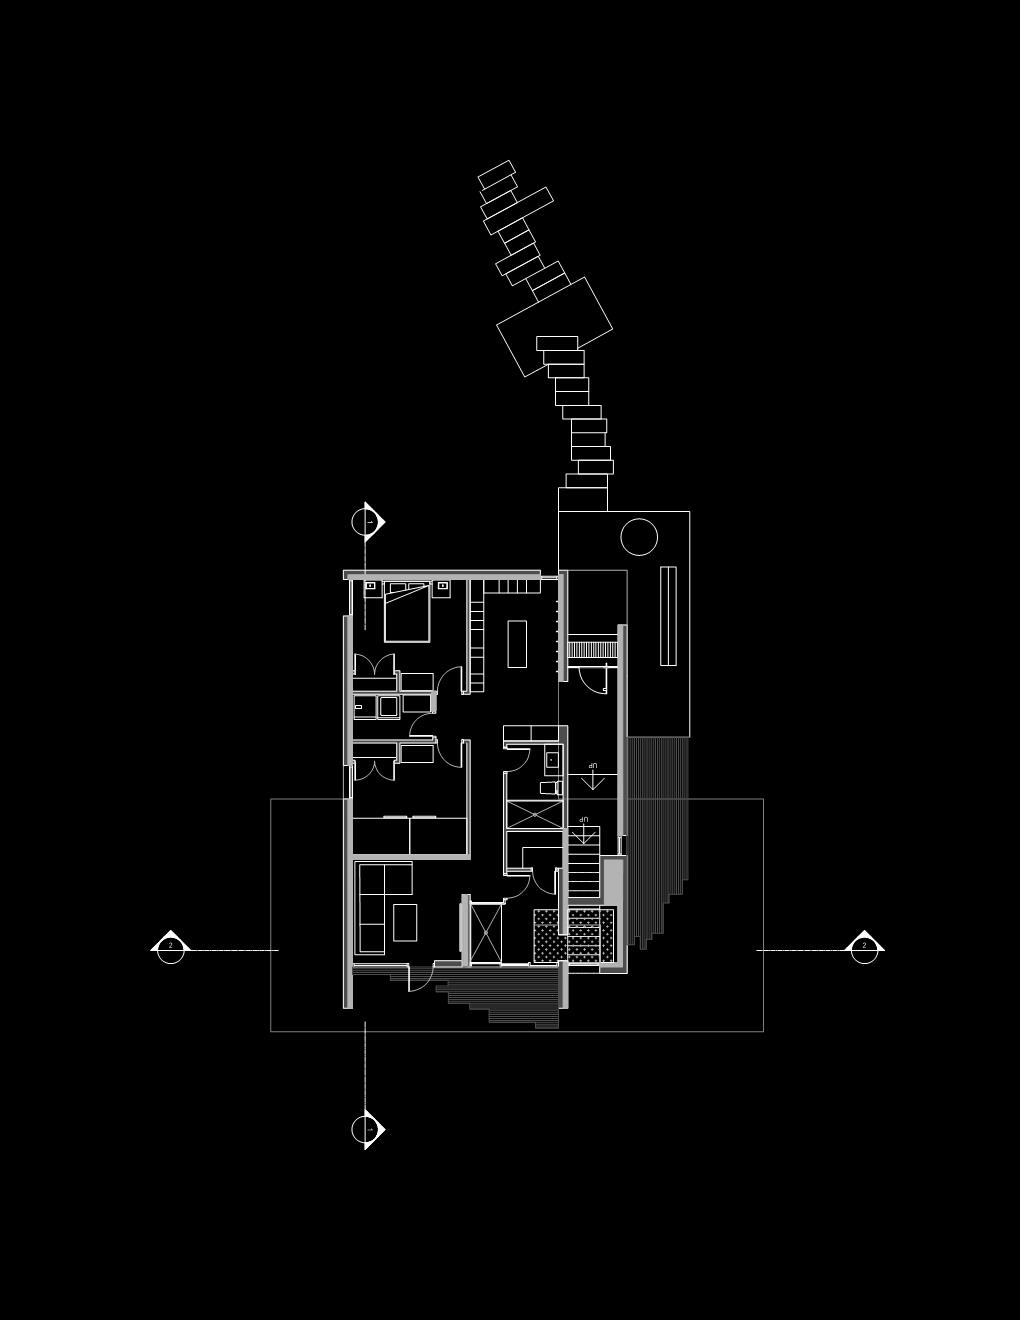 McKinley Burkart_Whistler_Plan_inverted.jpg